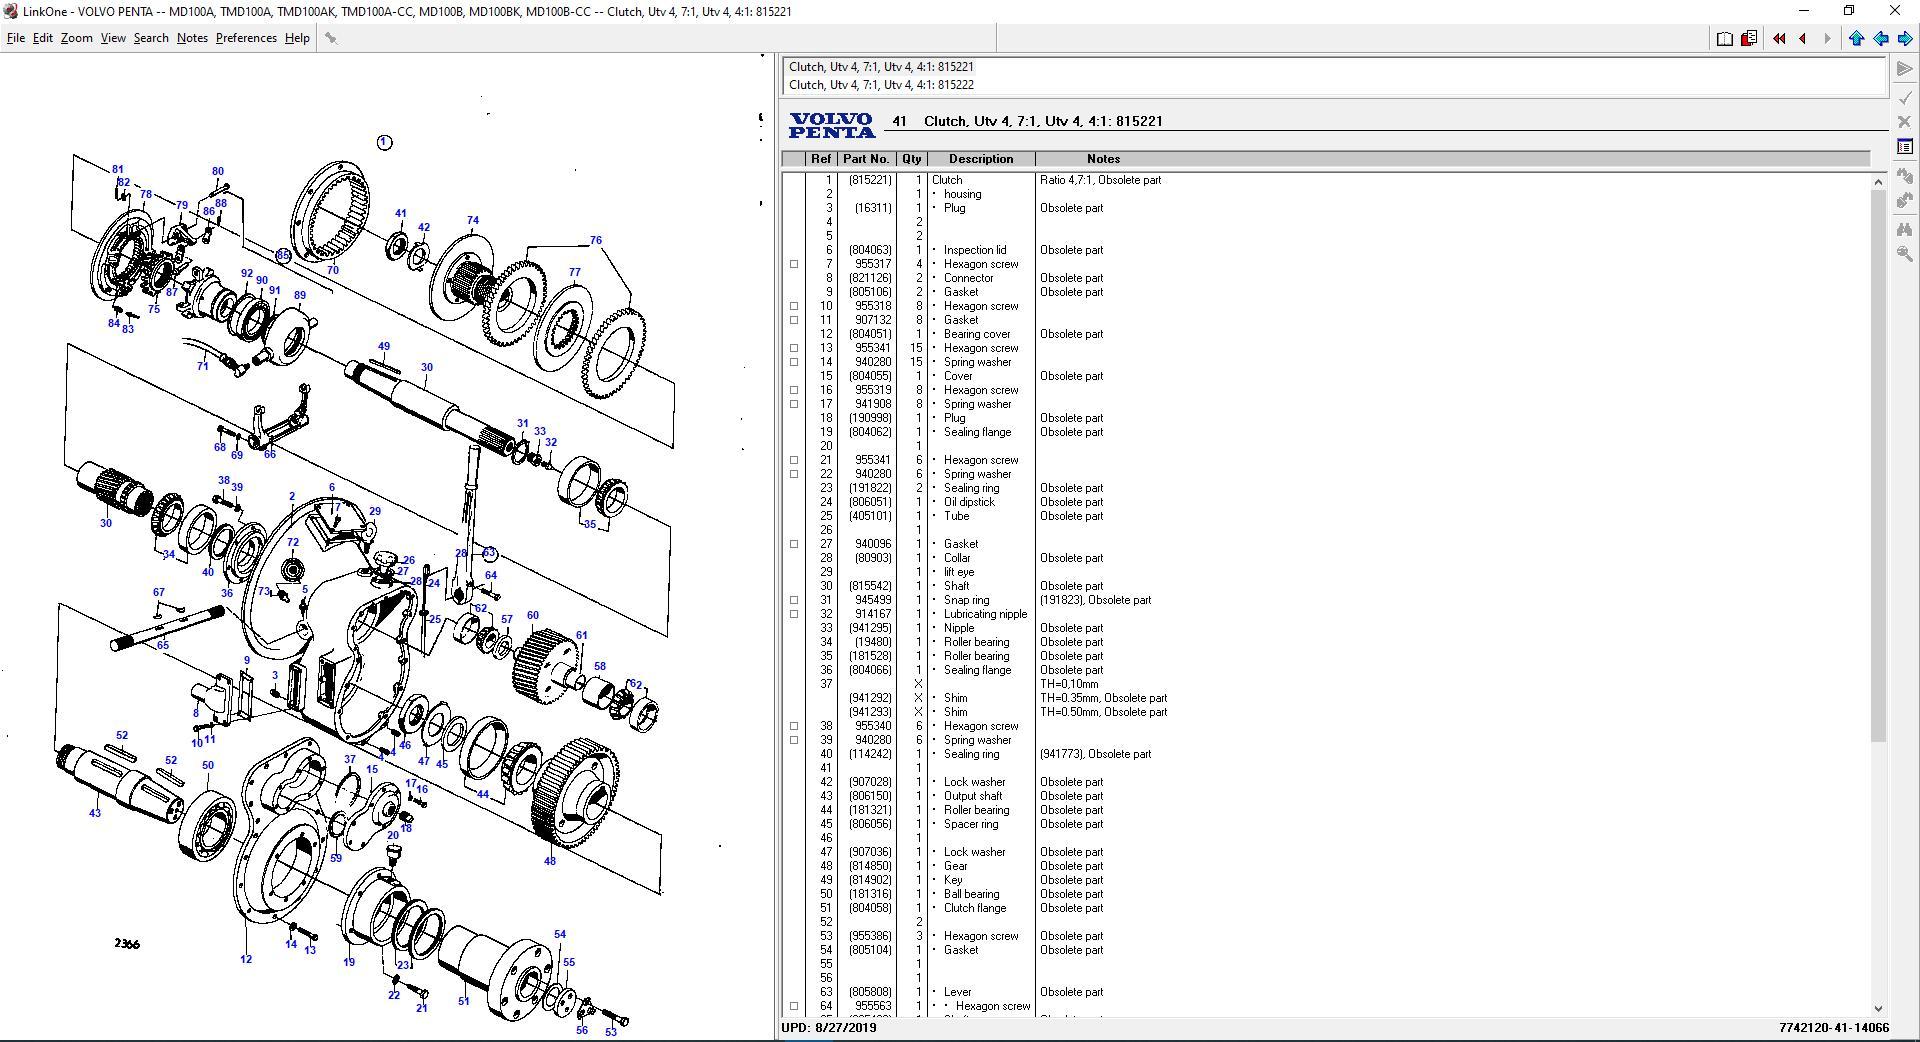 Volvo_Penta_EPC_112019_Marine_and_Industrial_Engine_Spare_Part_Catalog7